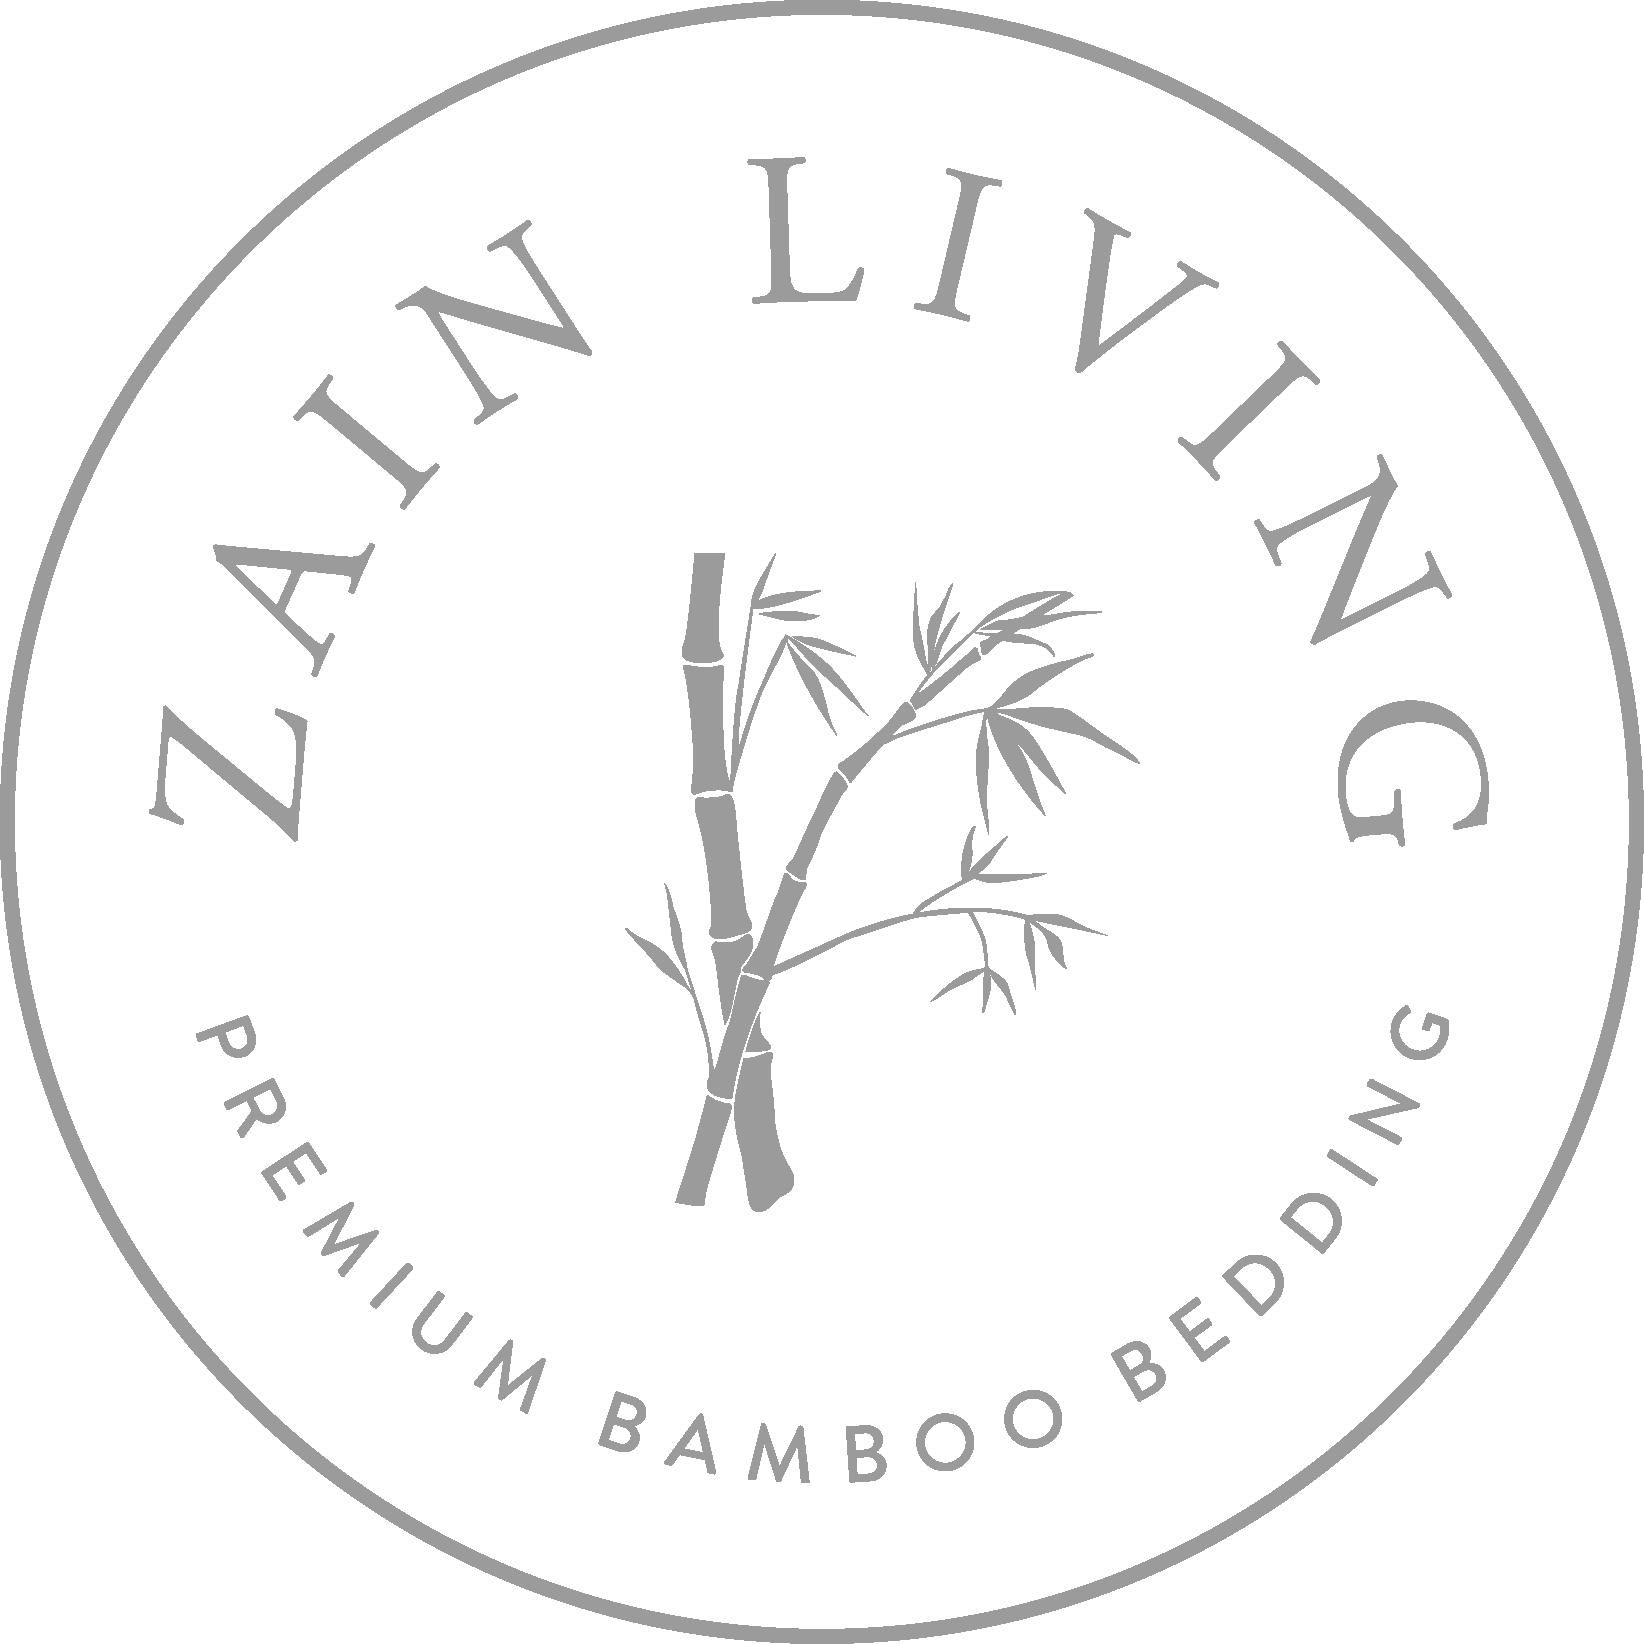 Zain Living premium bamboo bedding stamp logo